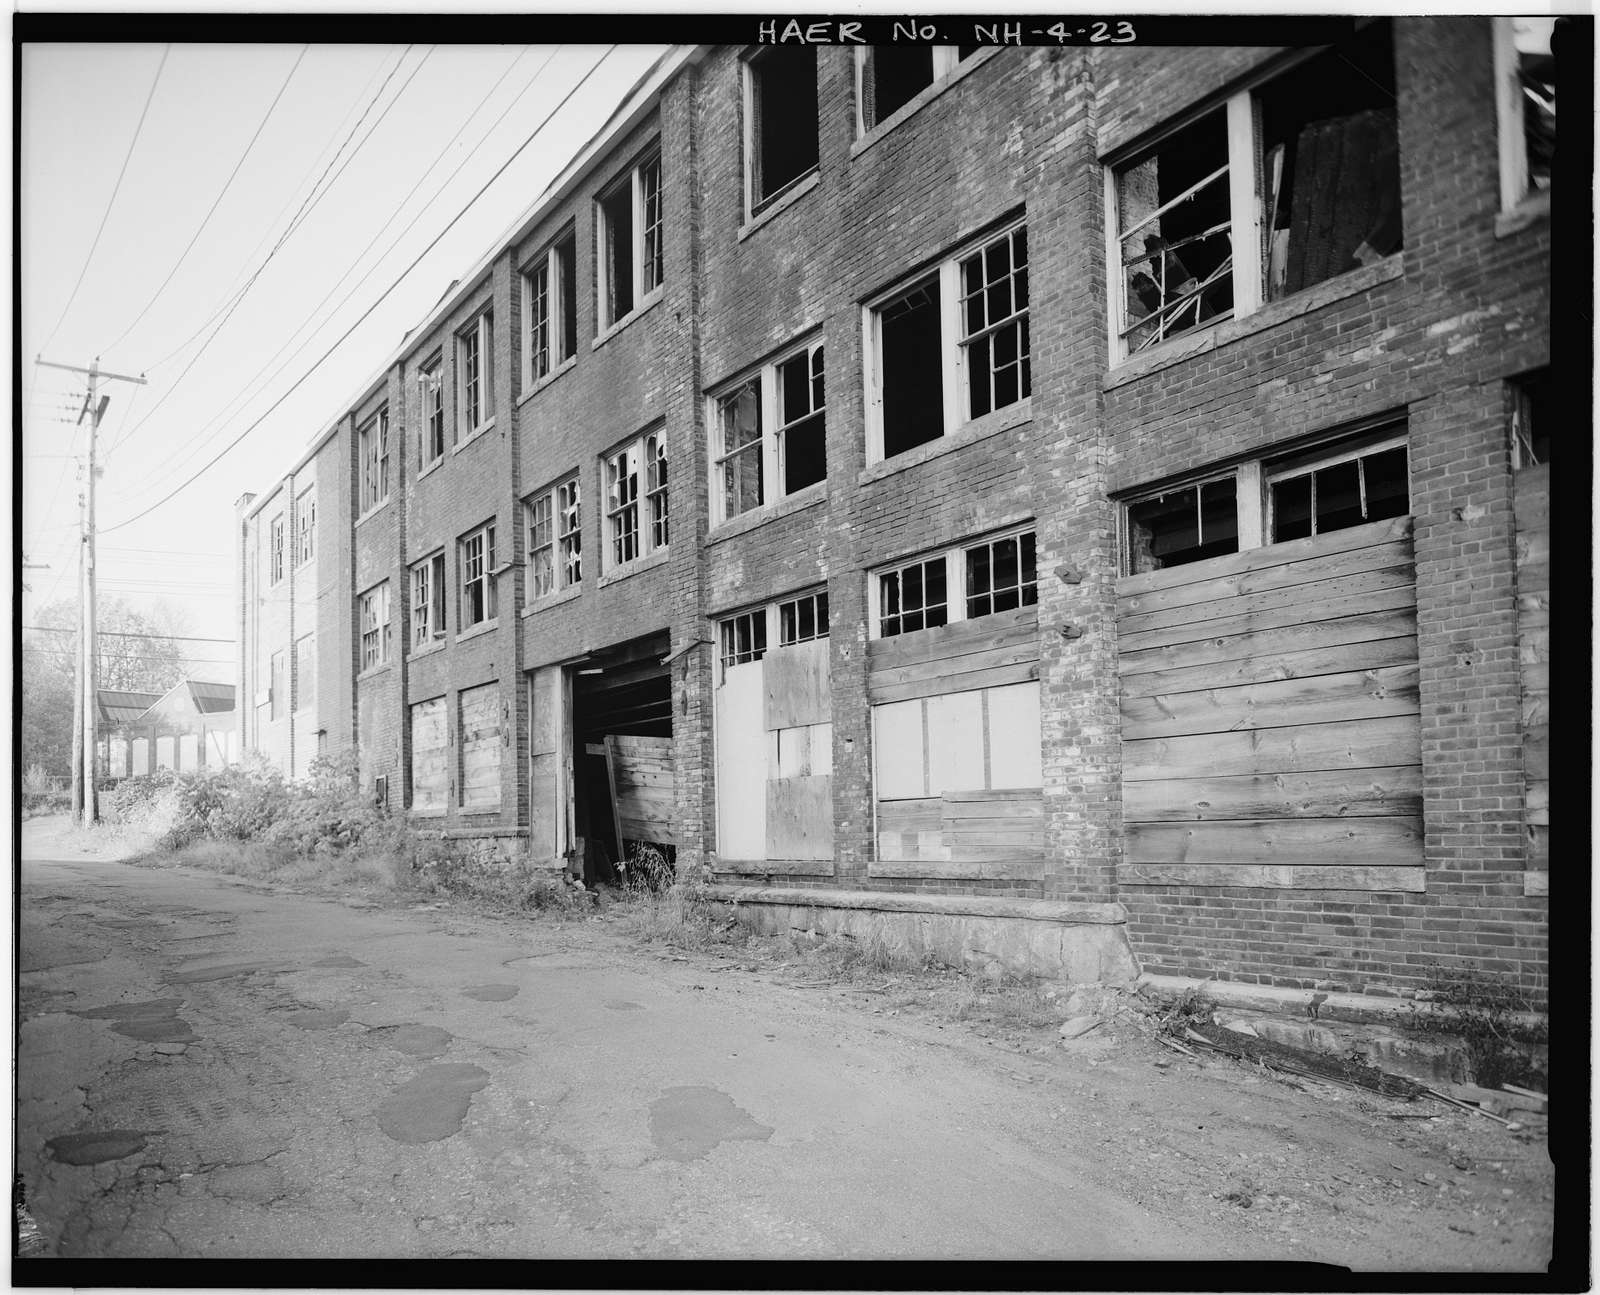 Sullivan Machinery Company, Main Street between Pearl & Water Streets, Claremont, Sullivan County, NH